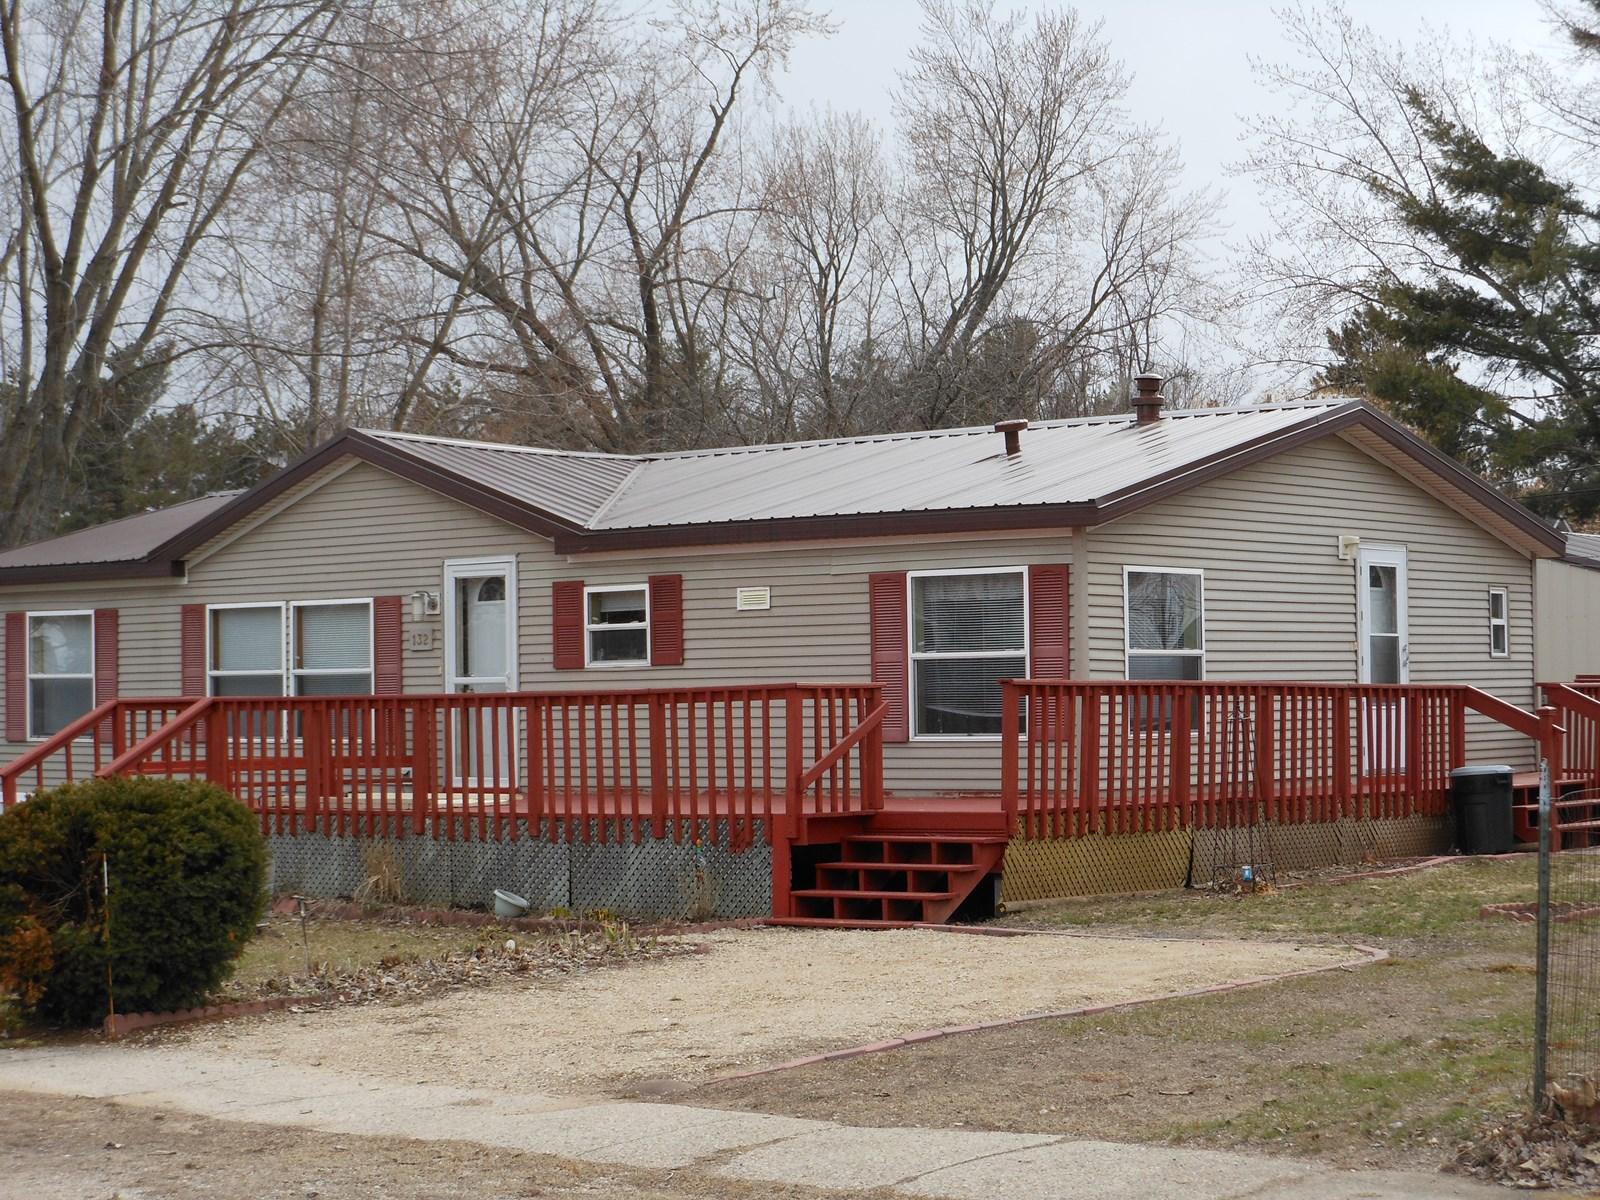 Home for Sale in Redgranite, WI